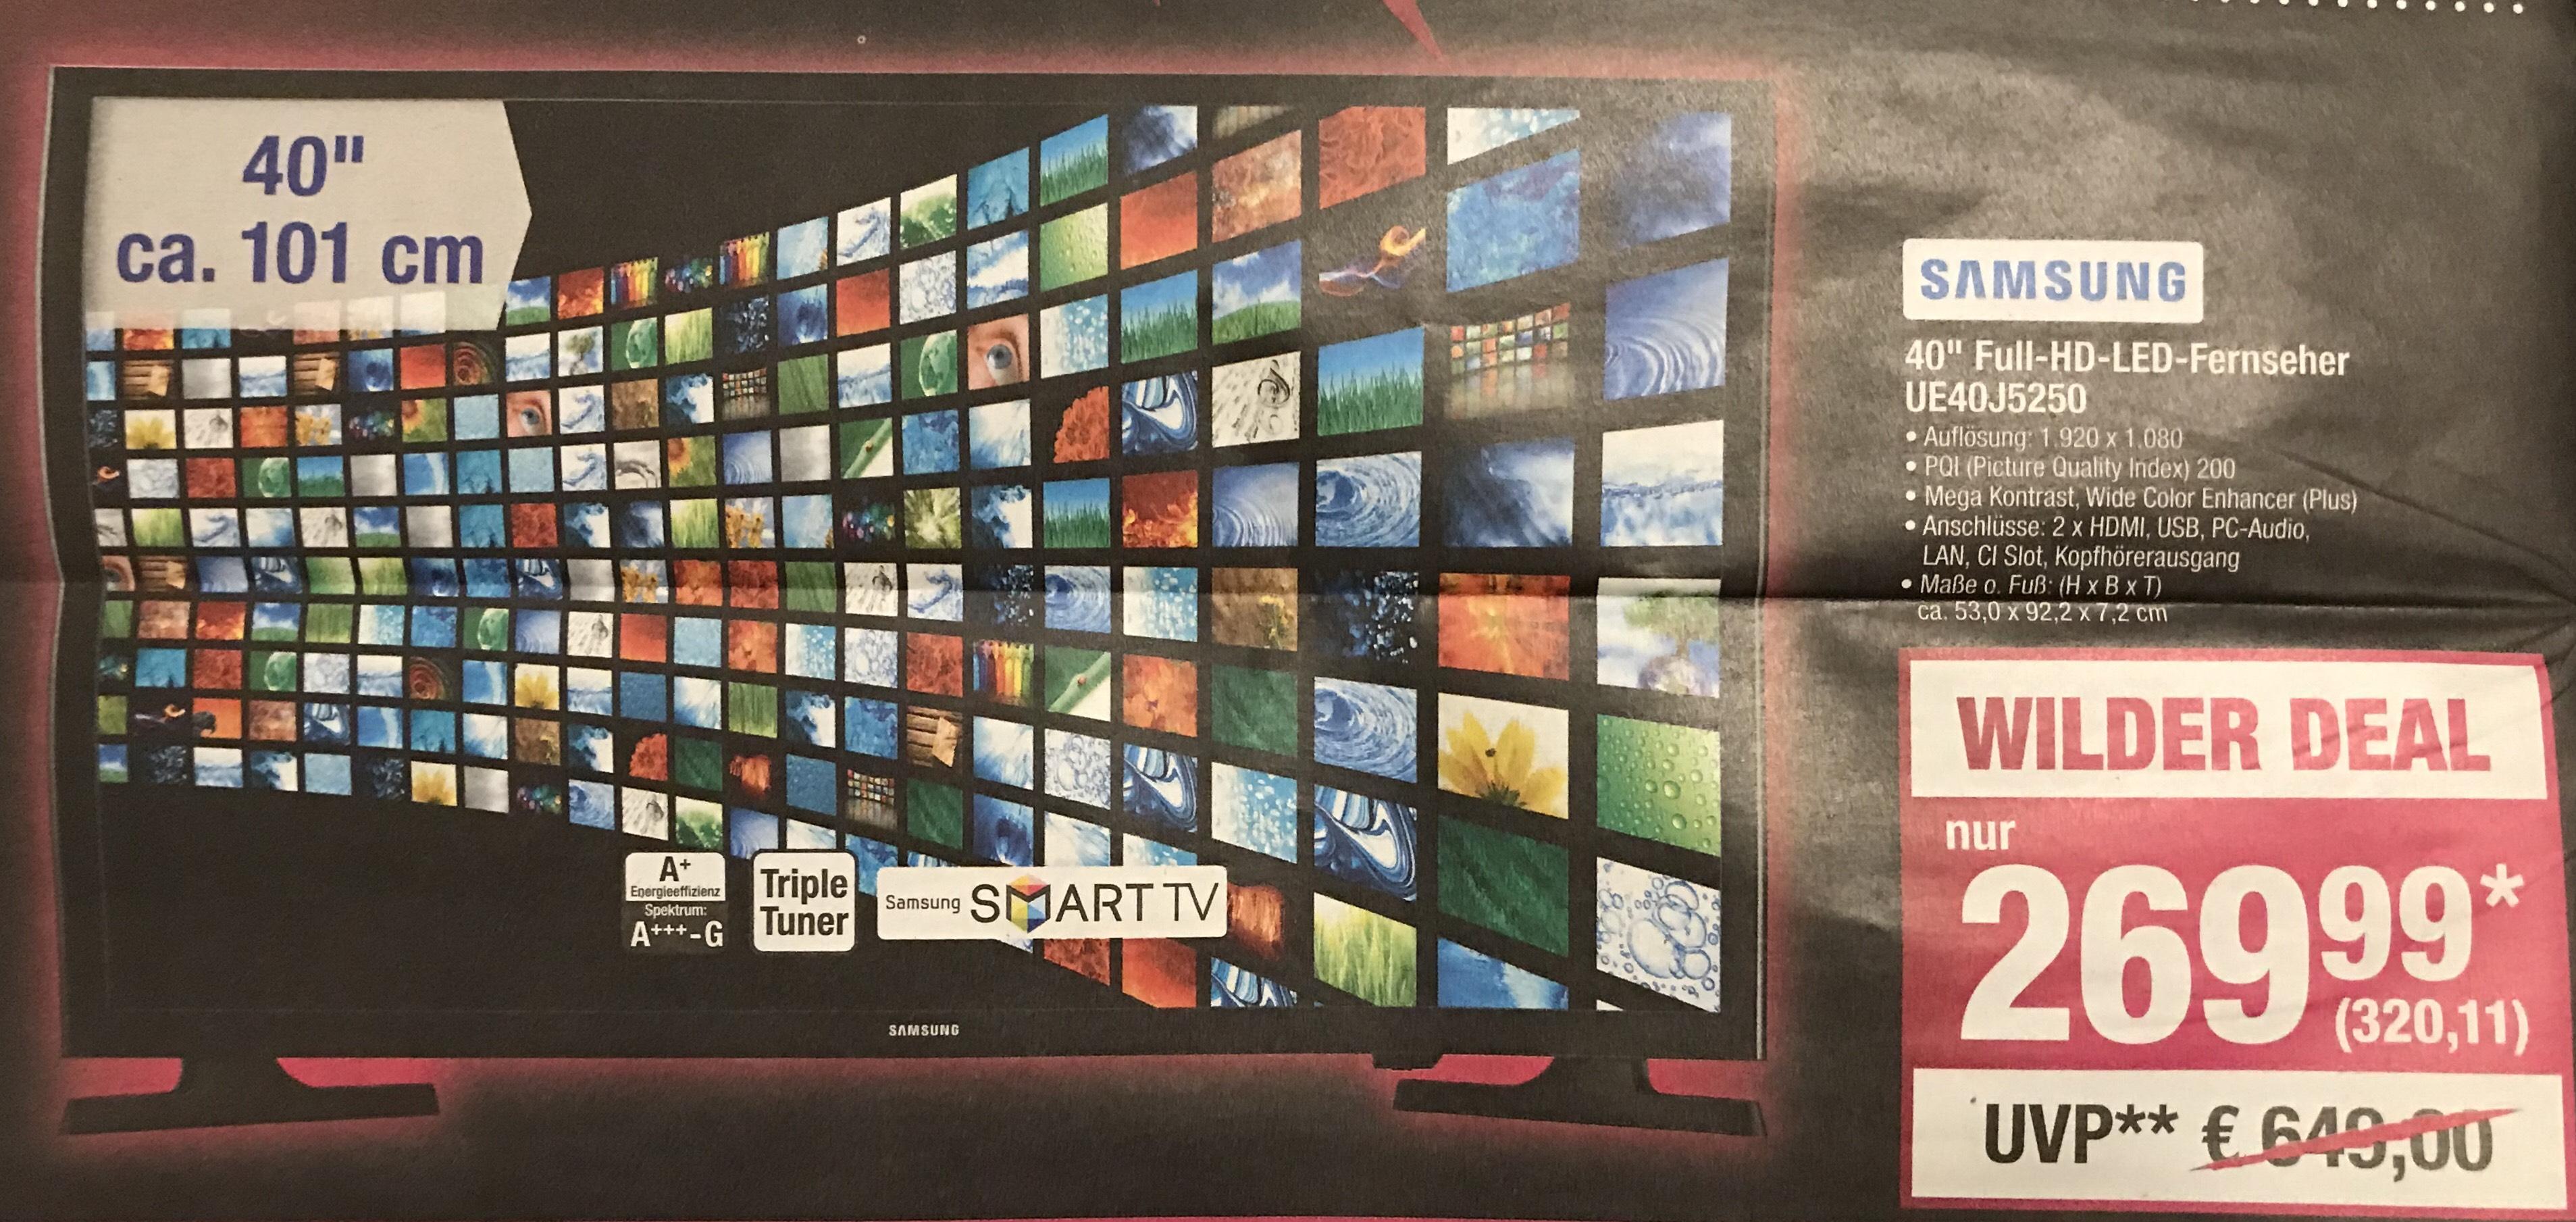 "Samsung 40"" Full-HD-LED-Fernseher UE40J5250"